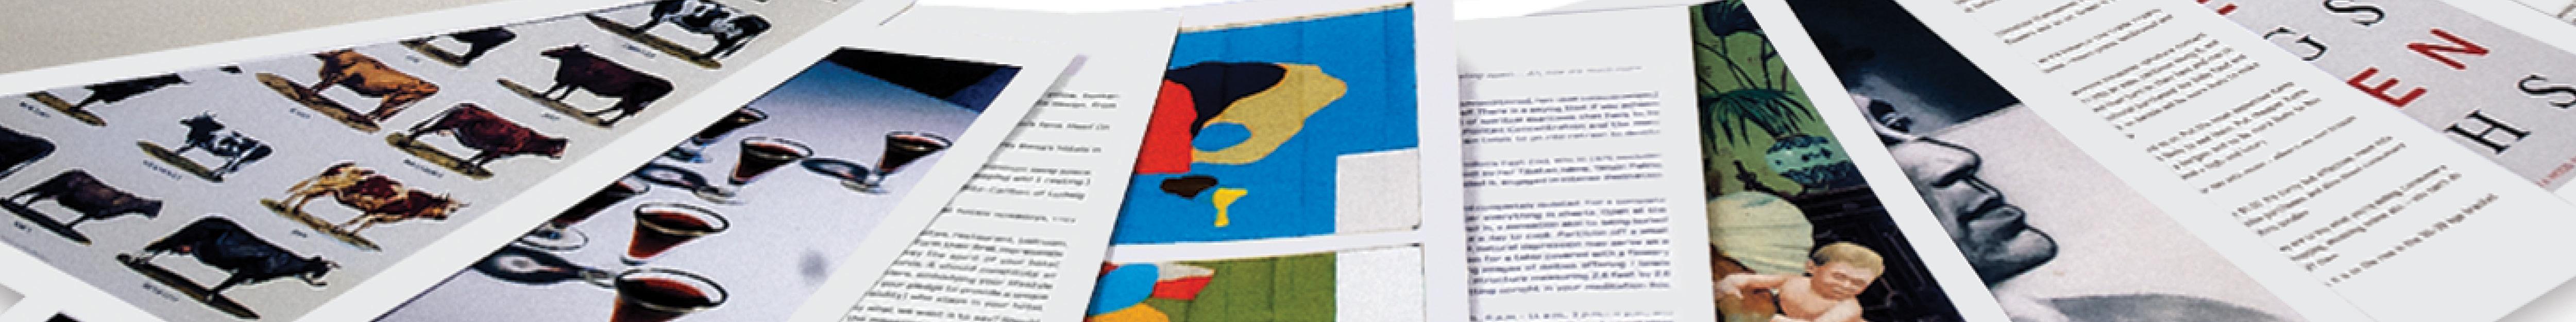 Books for Artists | BLICK Art Materials